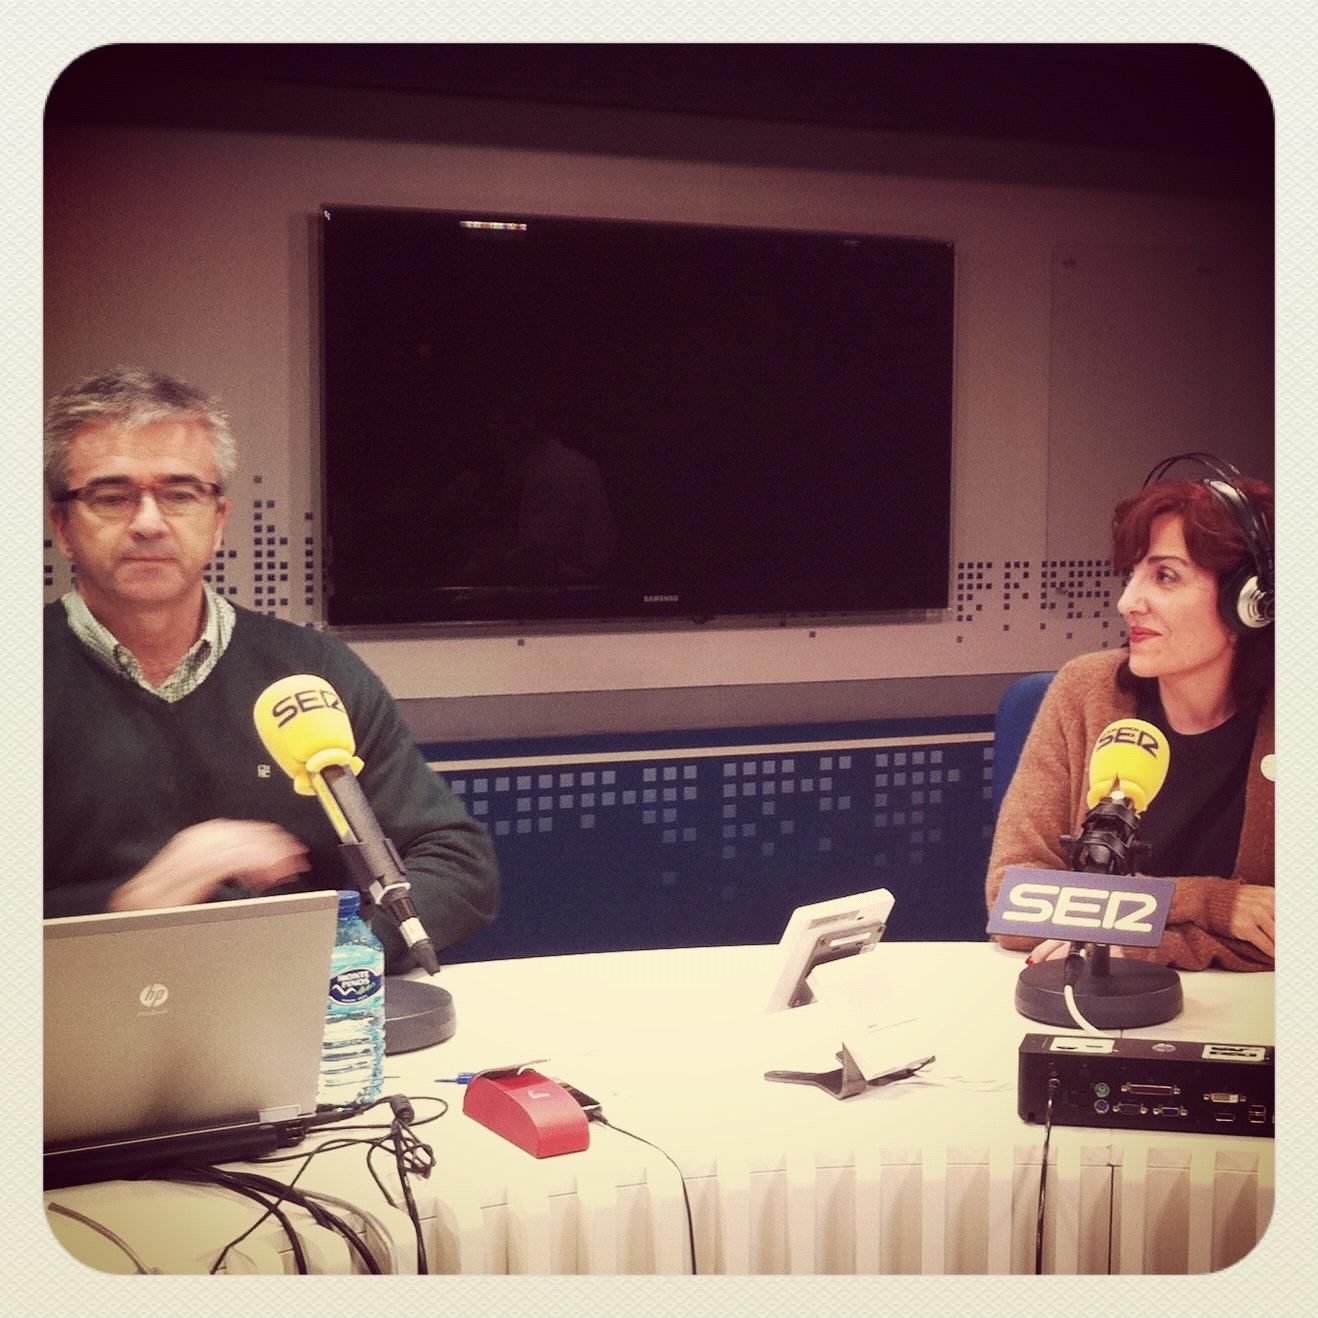 Entrevista A Elvira Lindo En La Ventana 08 11 2012 Elvira